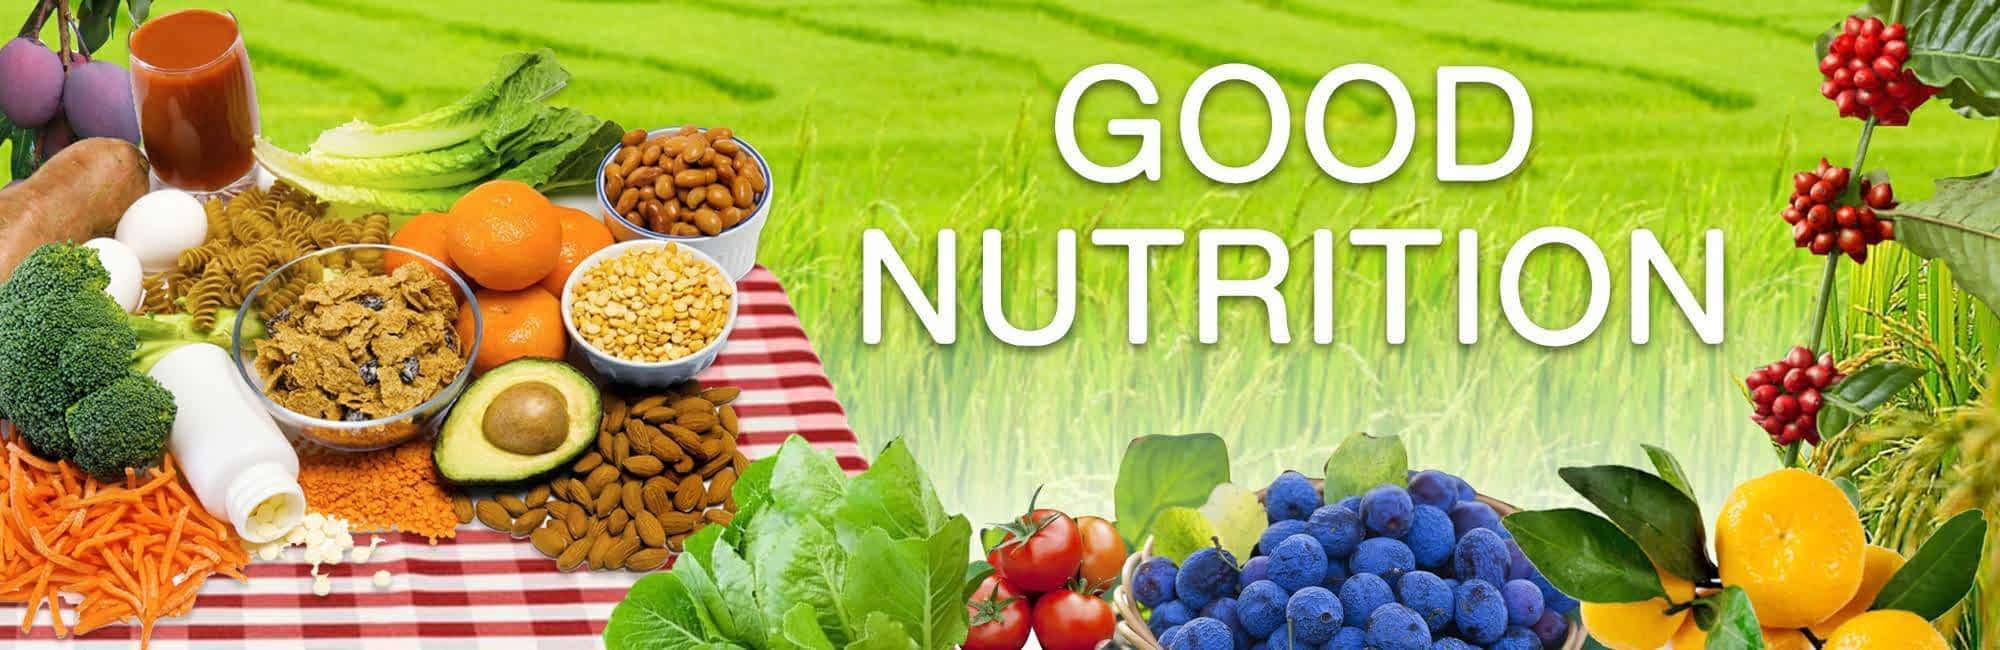 Healthy Kids - Nutrition Toolbox - Extension - University of Nevada, Reno